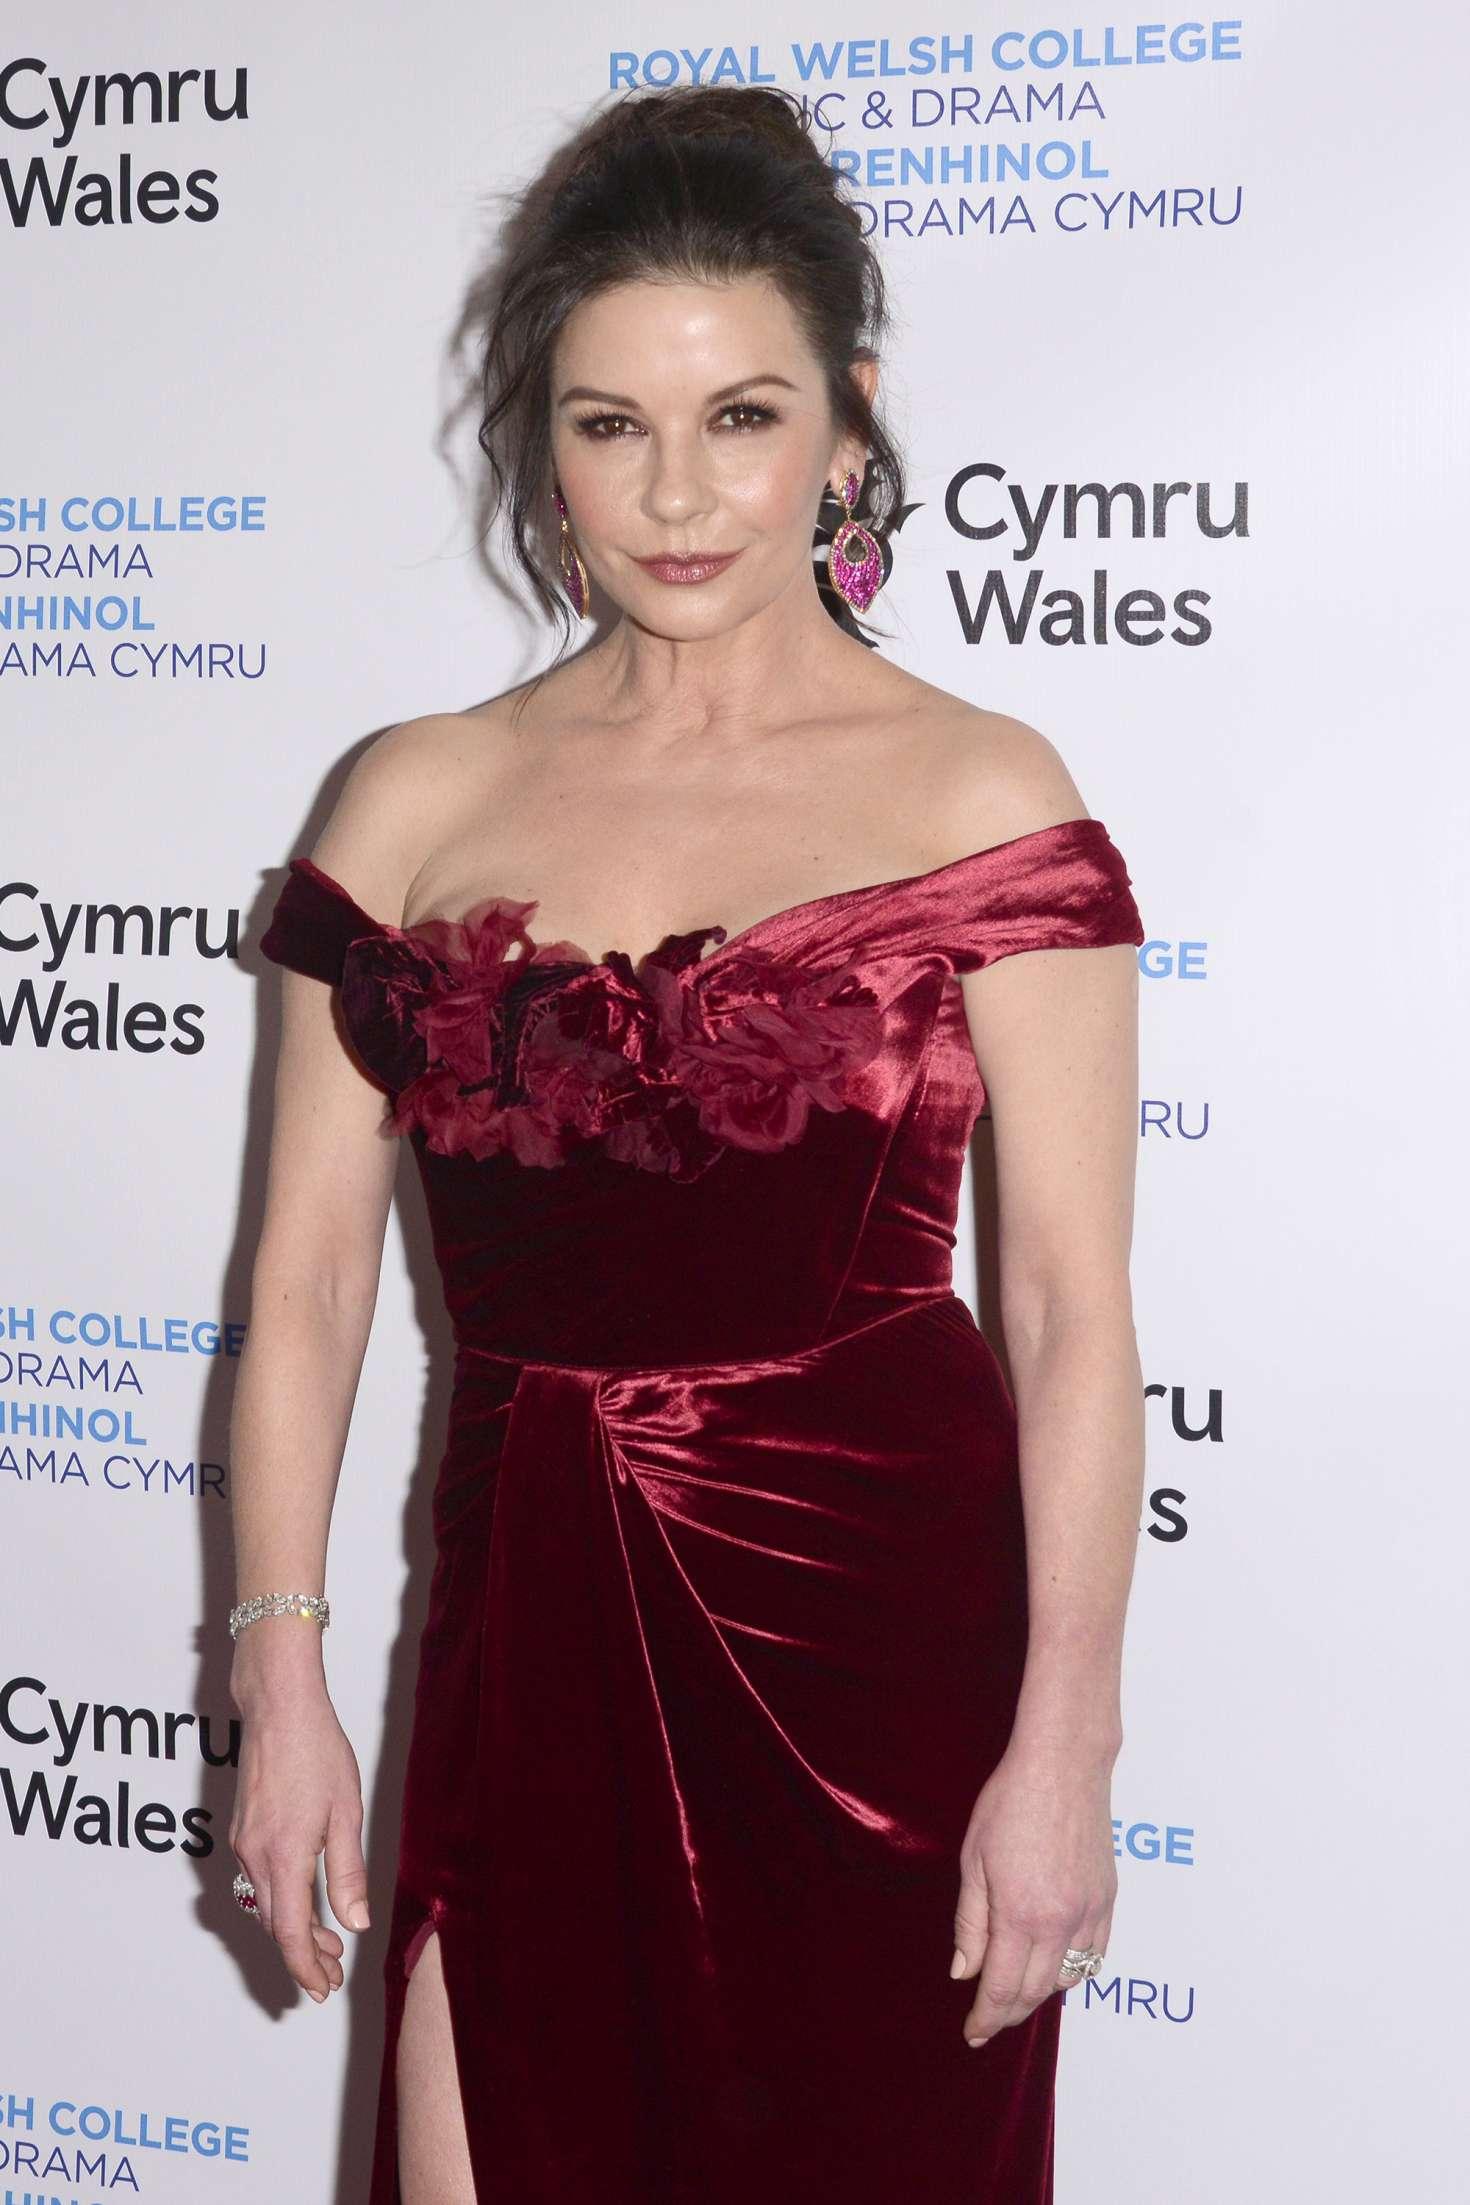 Catherine Zeta-Jones - Royal Welsh College of Music & Drama 2019 Gala in NYC